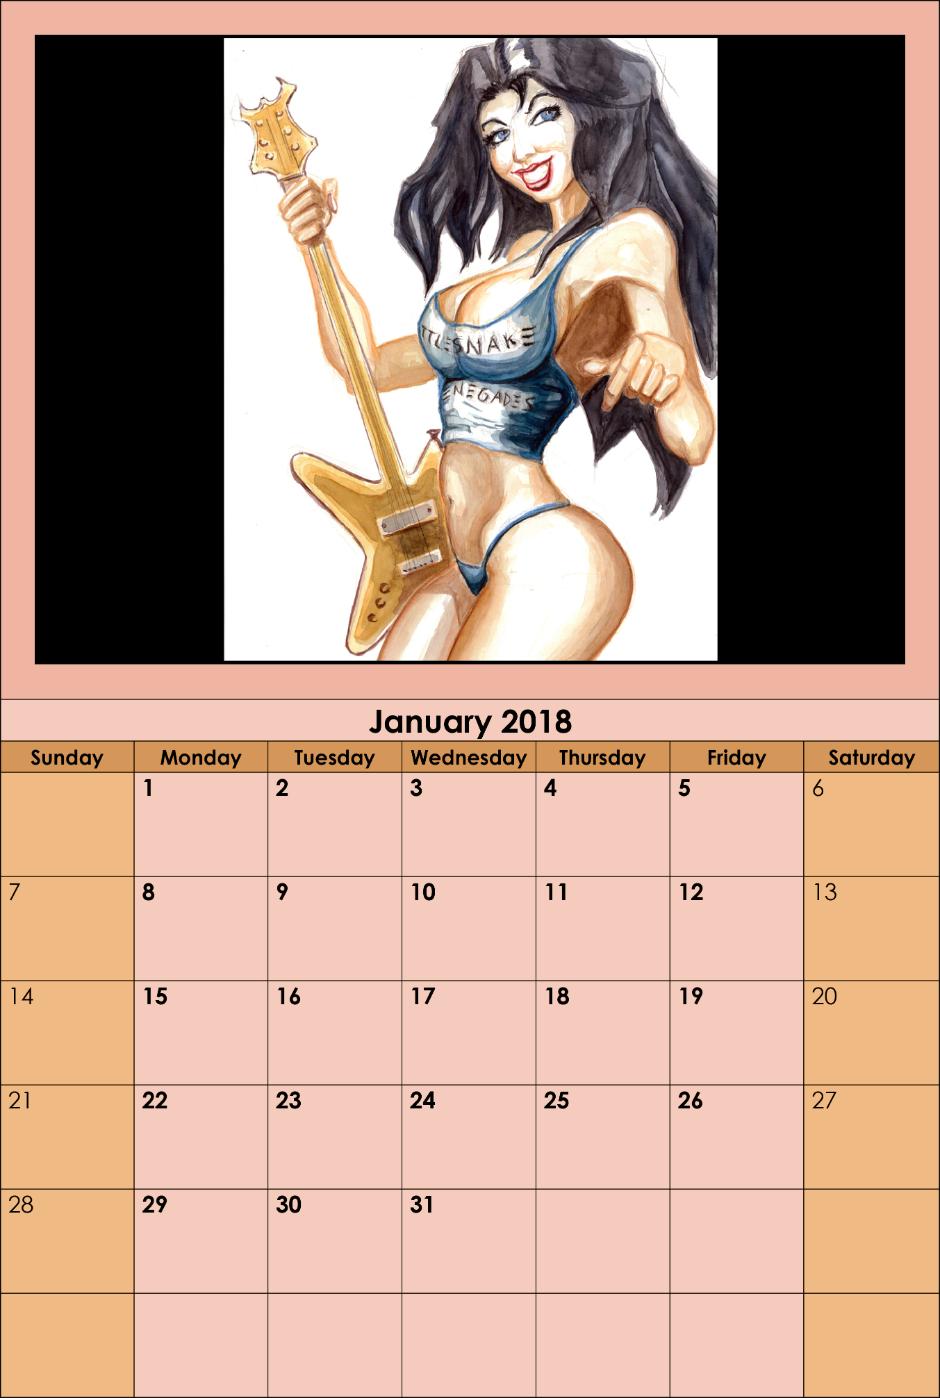 Opidane - January